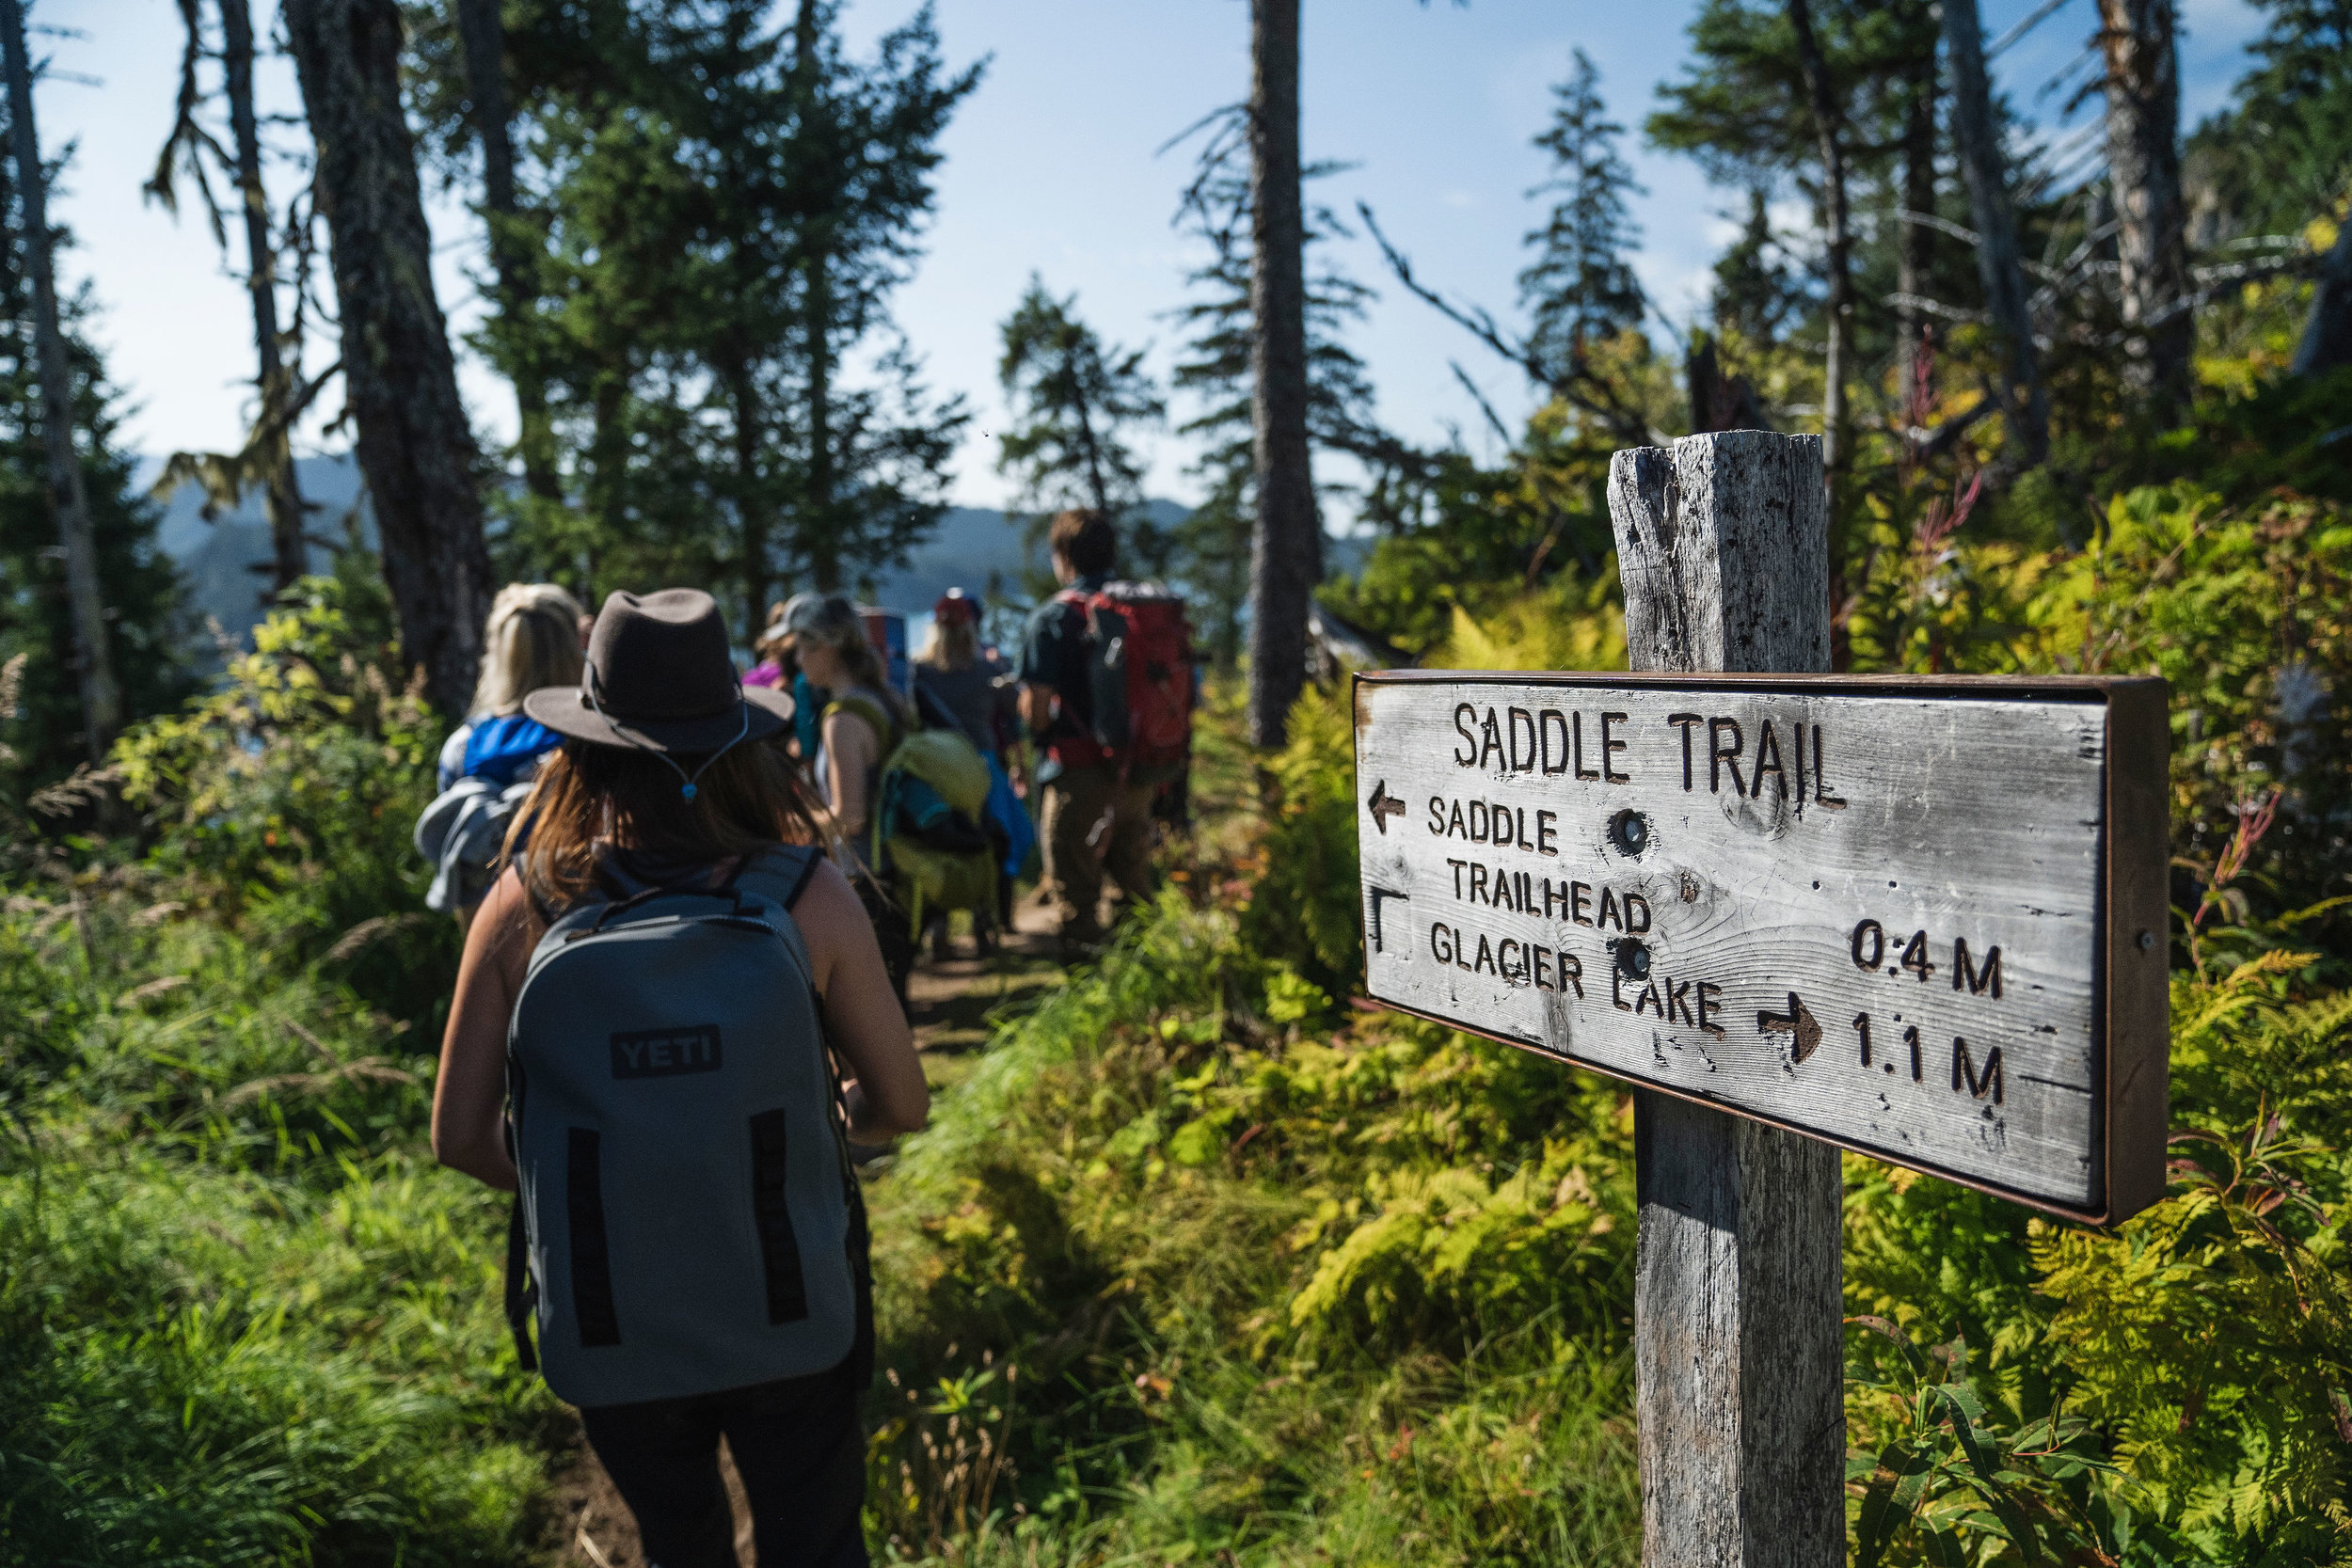 Saddle Ridge Trailhead